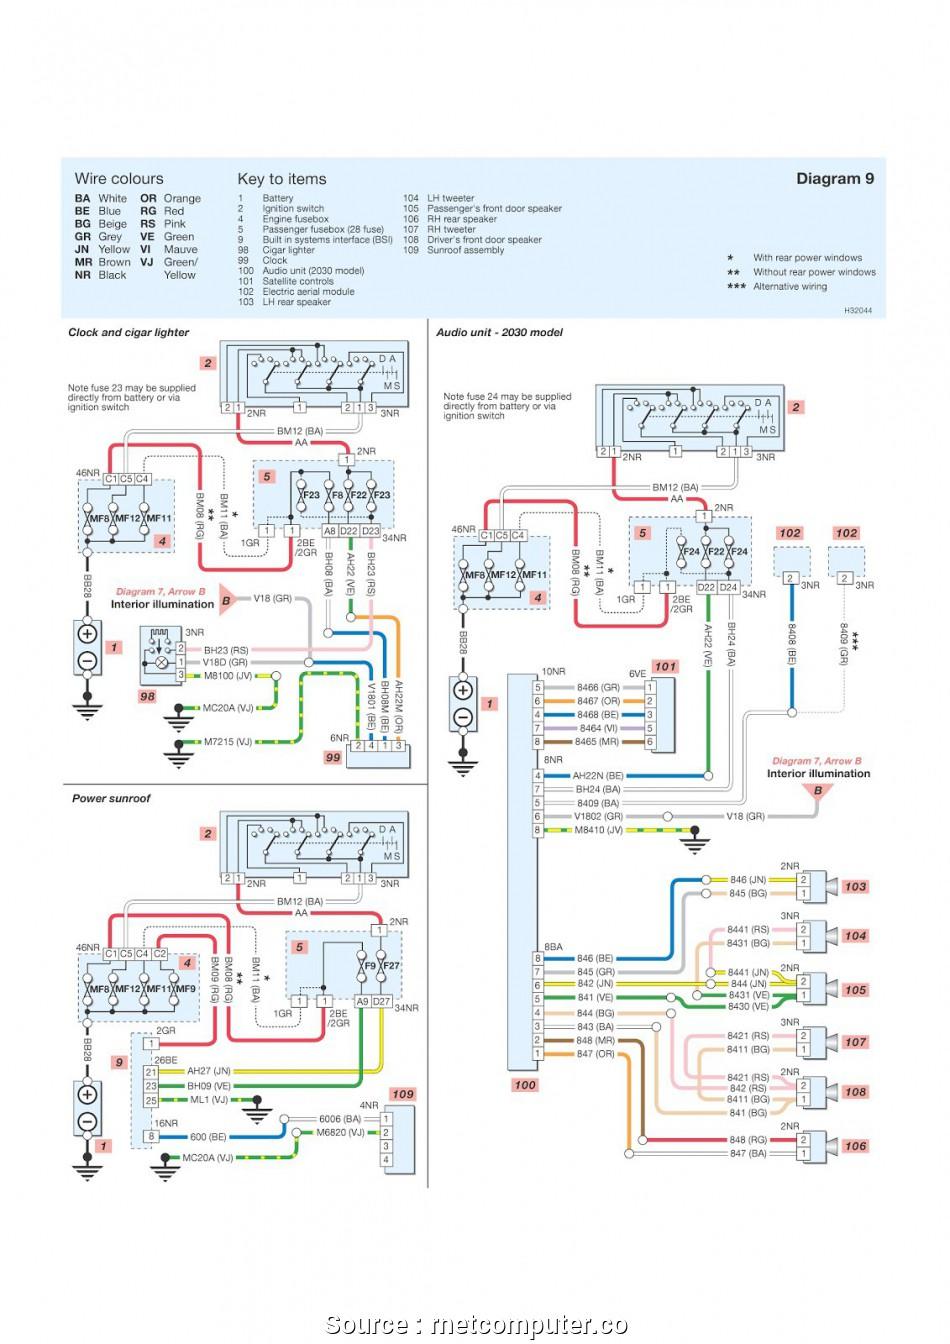 Peugeot 307 Bsi Wiring Diagram